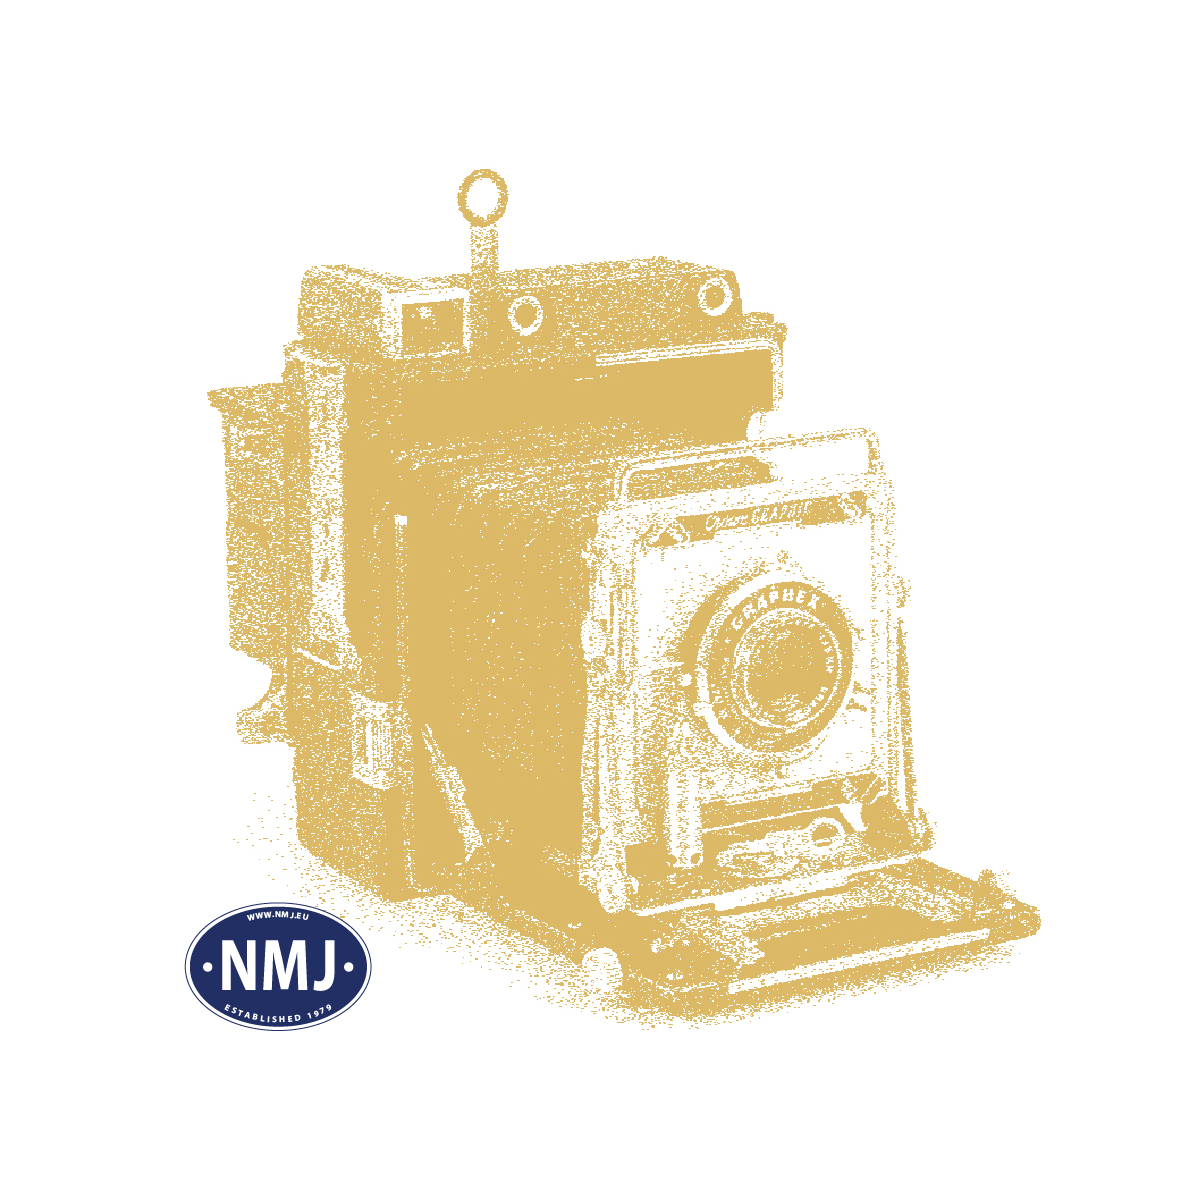 NMJT95304 - NMJ Topline CFL 1601 (1956-1971), AC m/ Sound